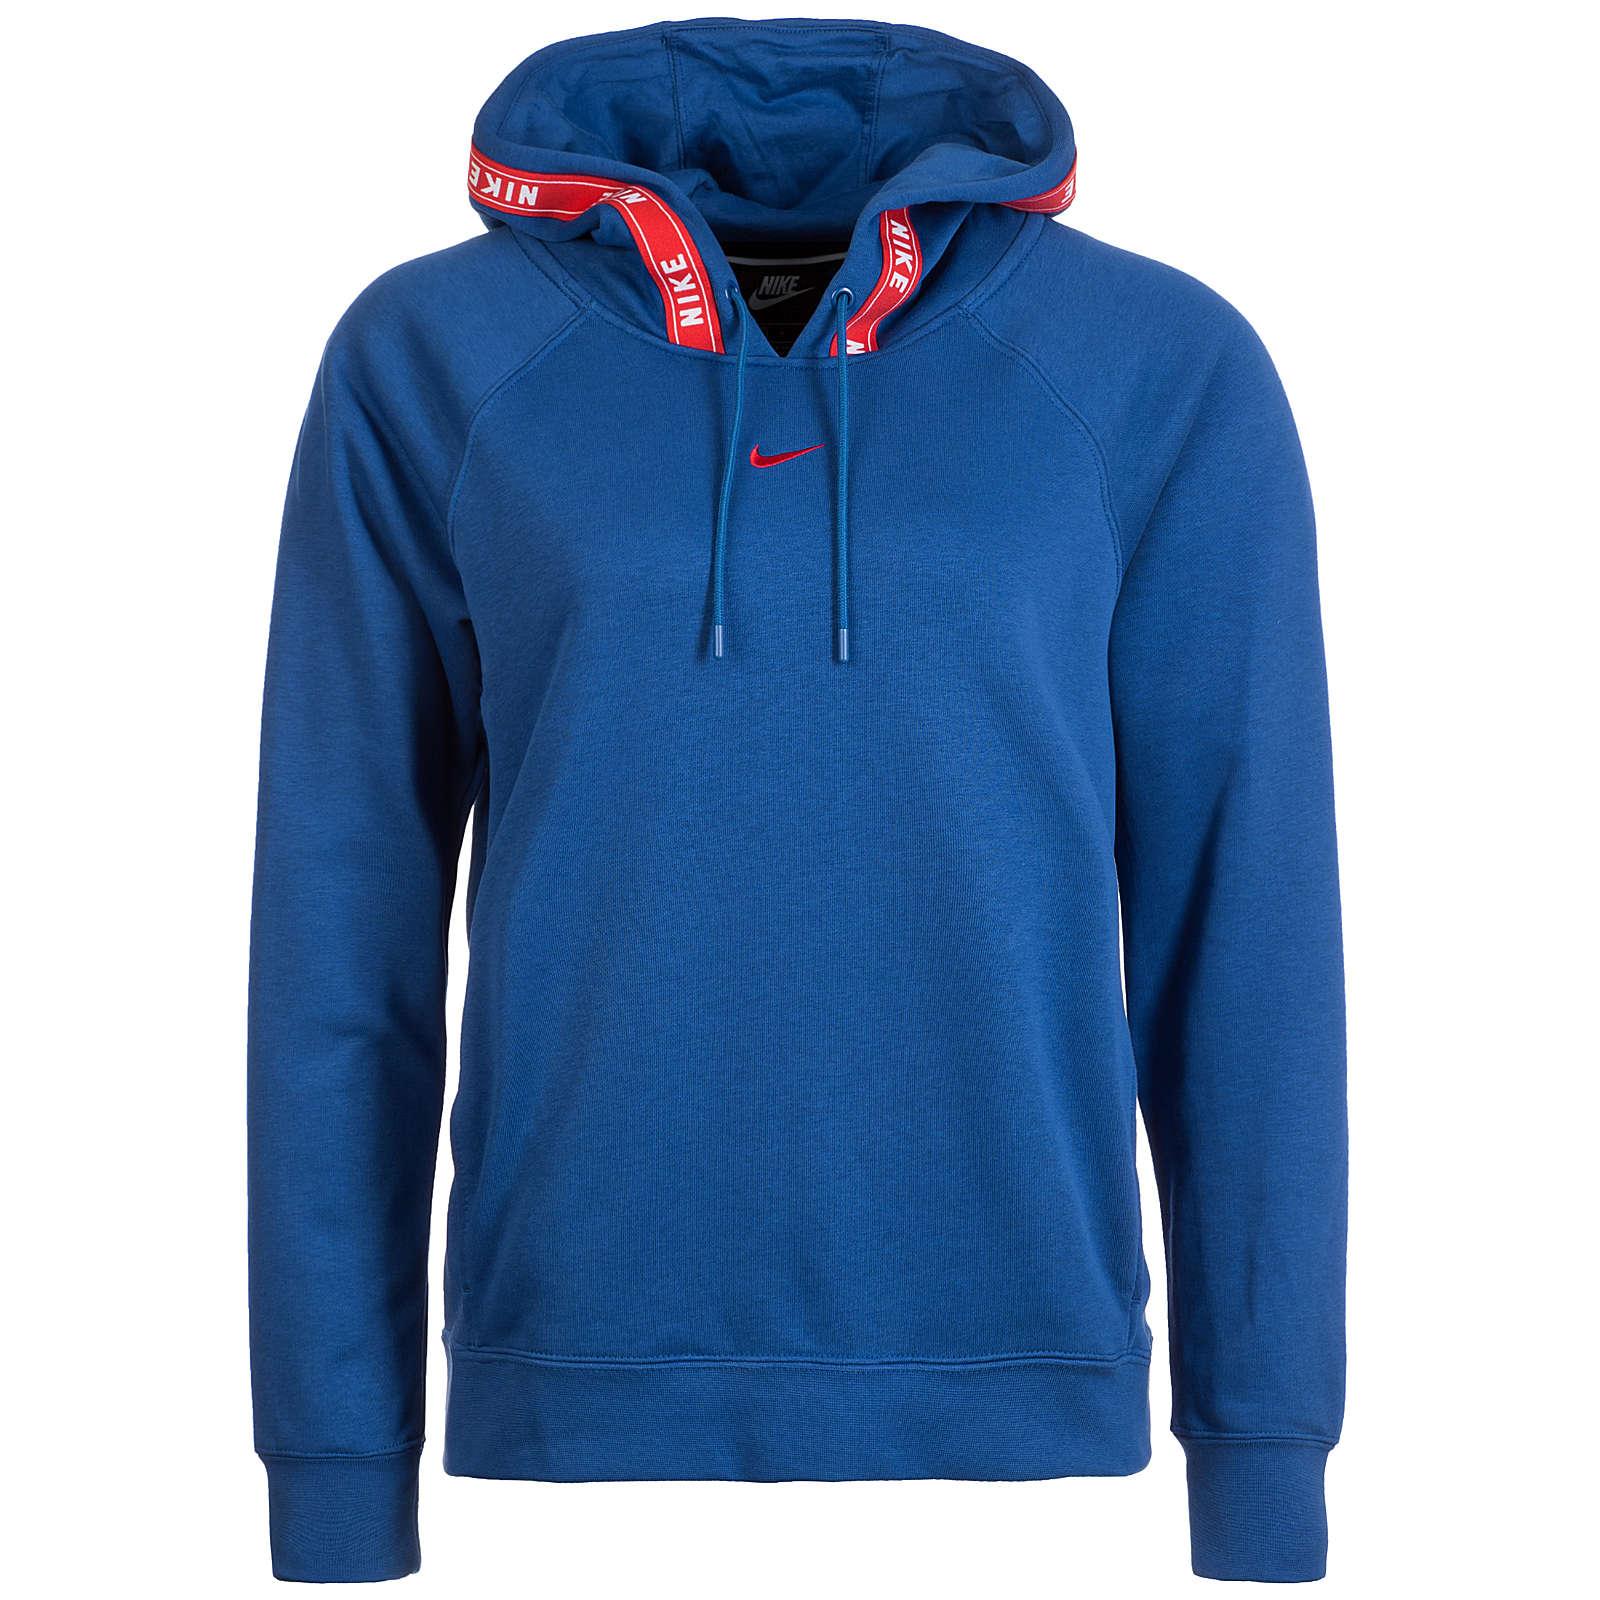 Nike Sportswear Logo Tape Kapuzenpullover Damen blau Damen Gr. 40